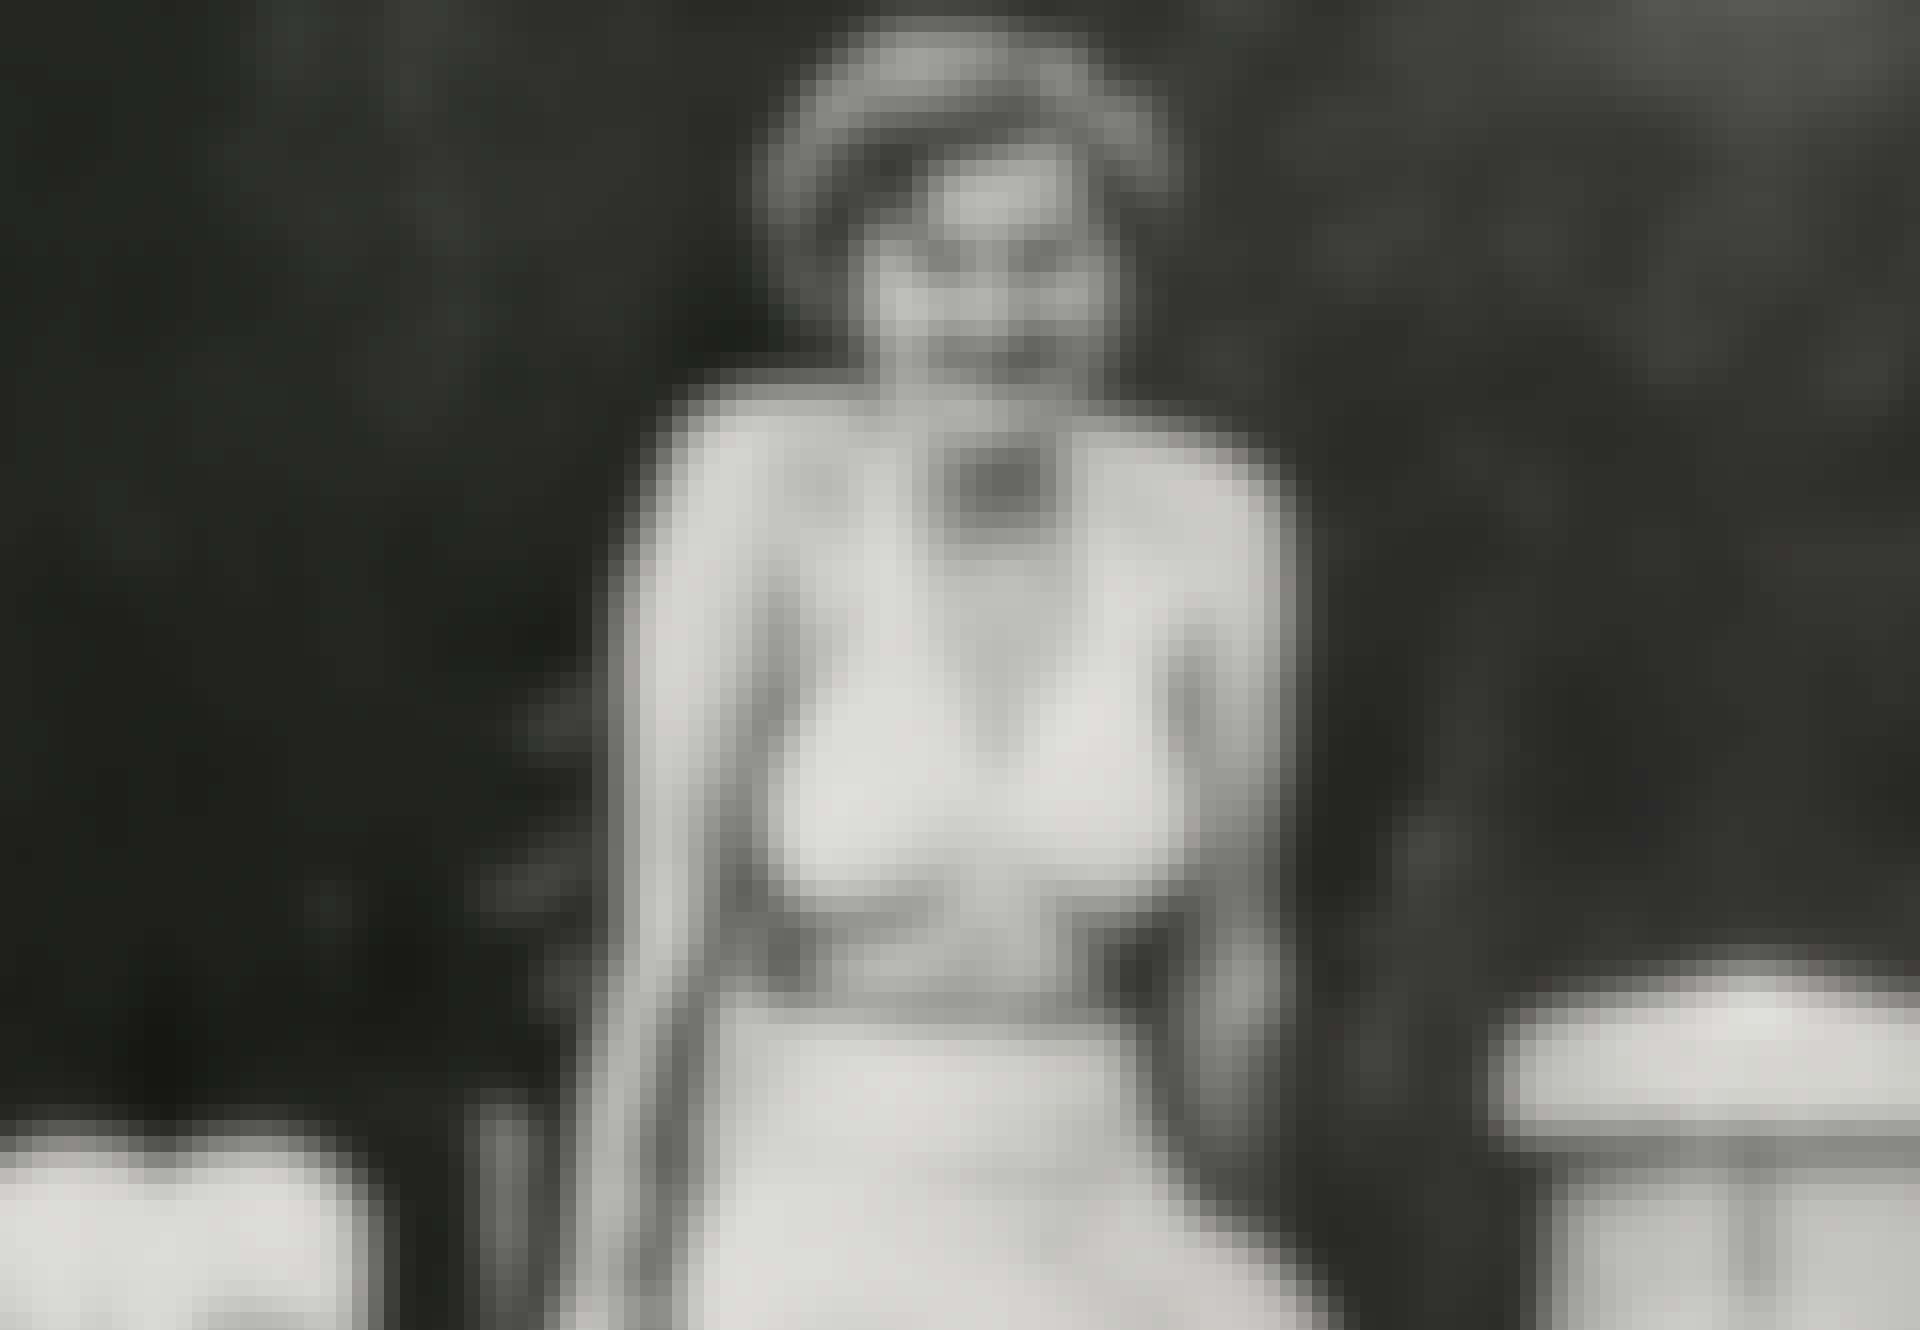 Ung Eva Braun